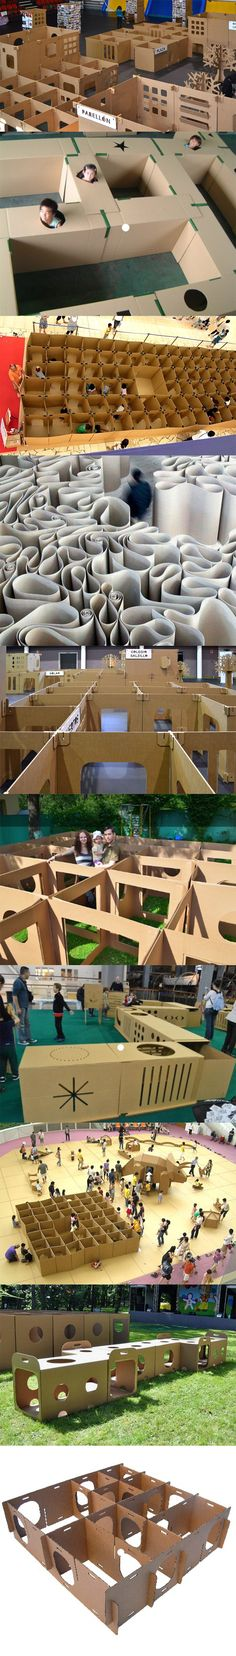 Kids love cardboard mazes! Labyrinth made in cardboard perfect for children activities #labyrinth #maze #cardboardmaze